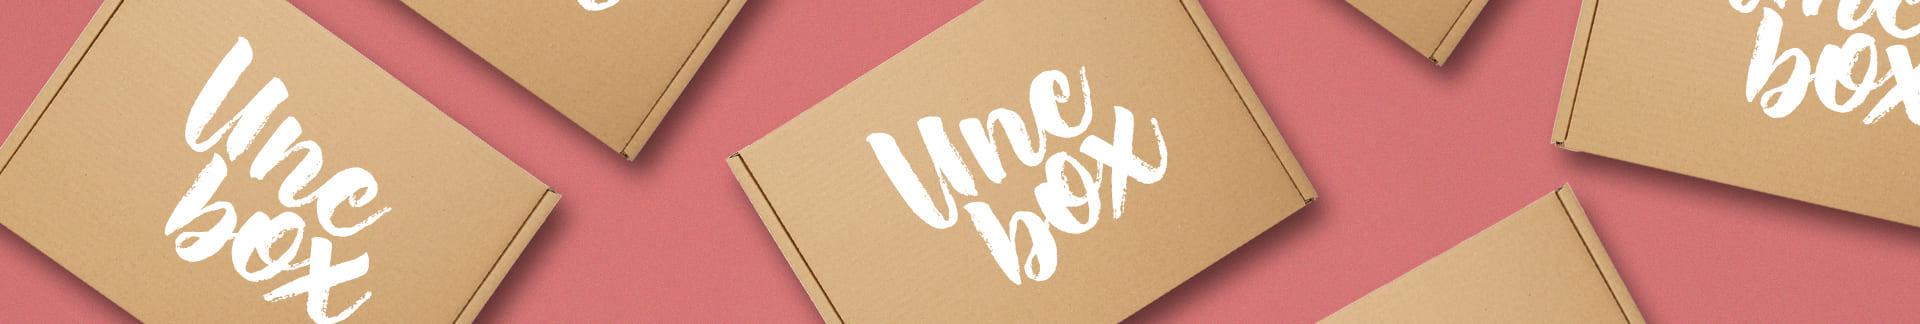 unebox-formulario-header